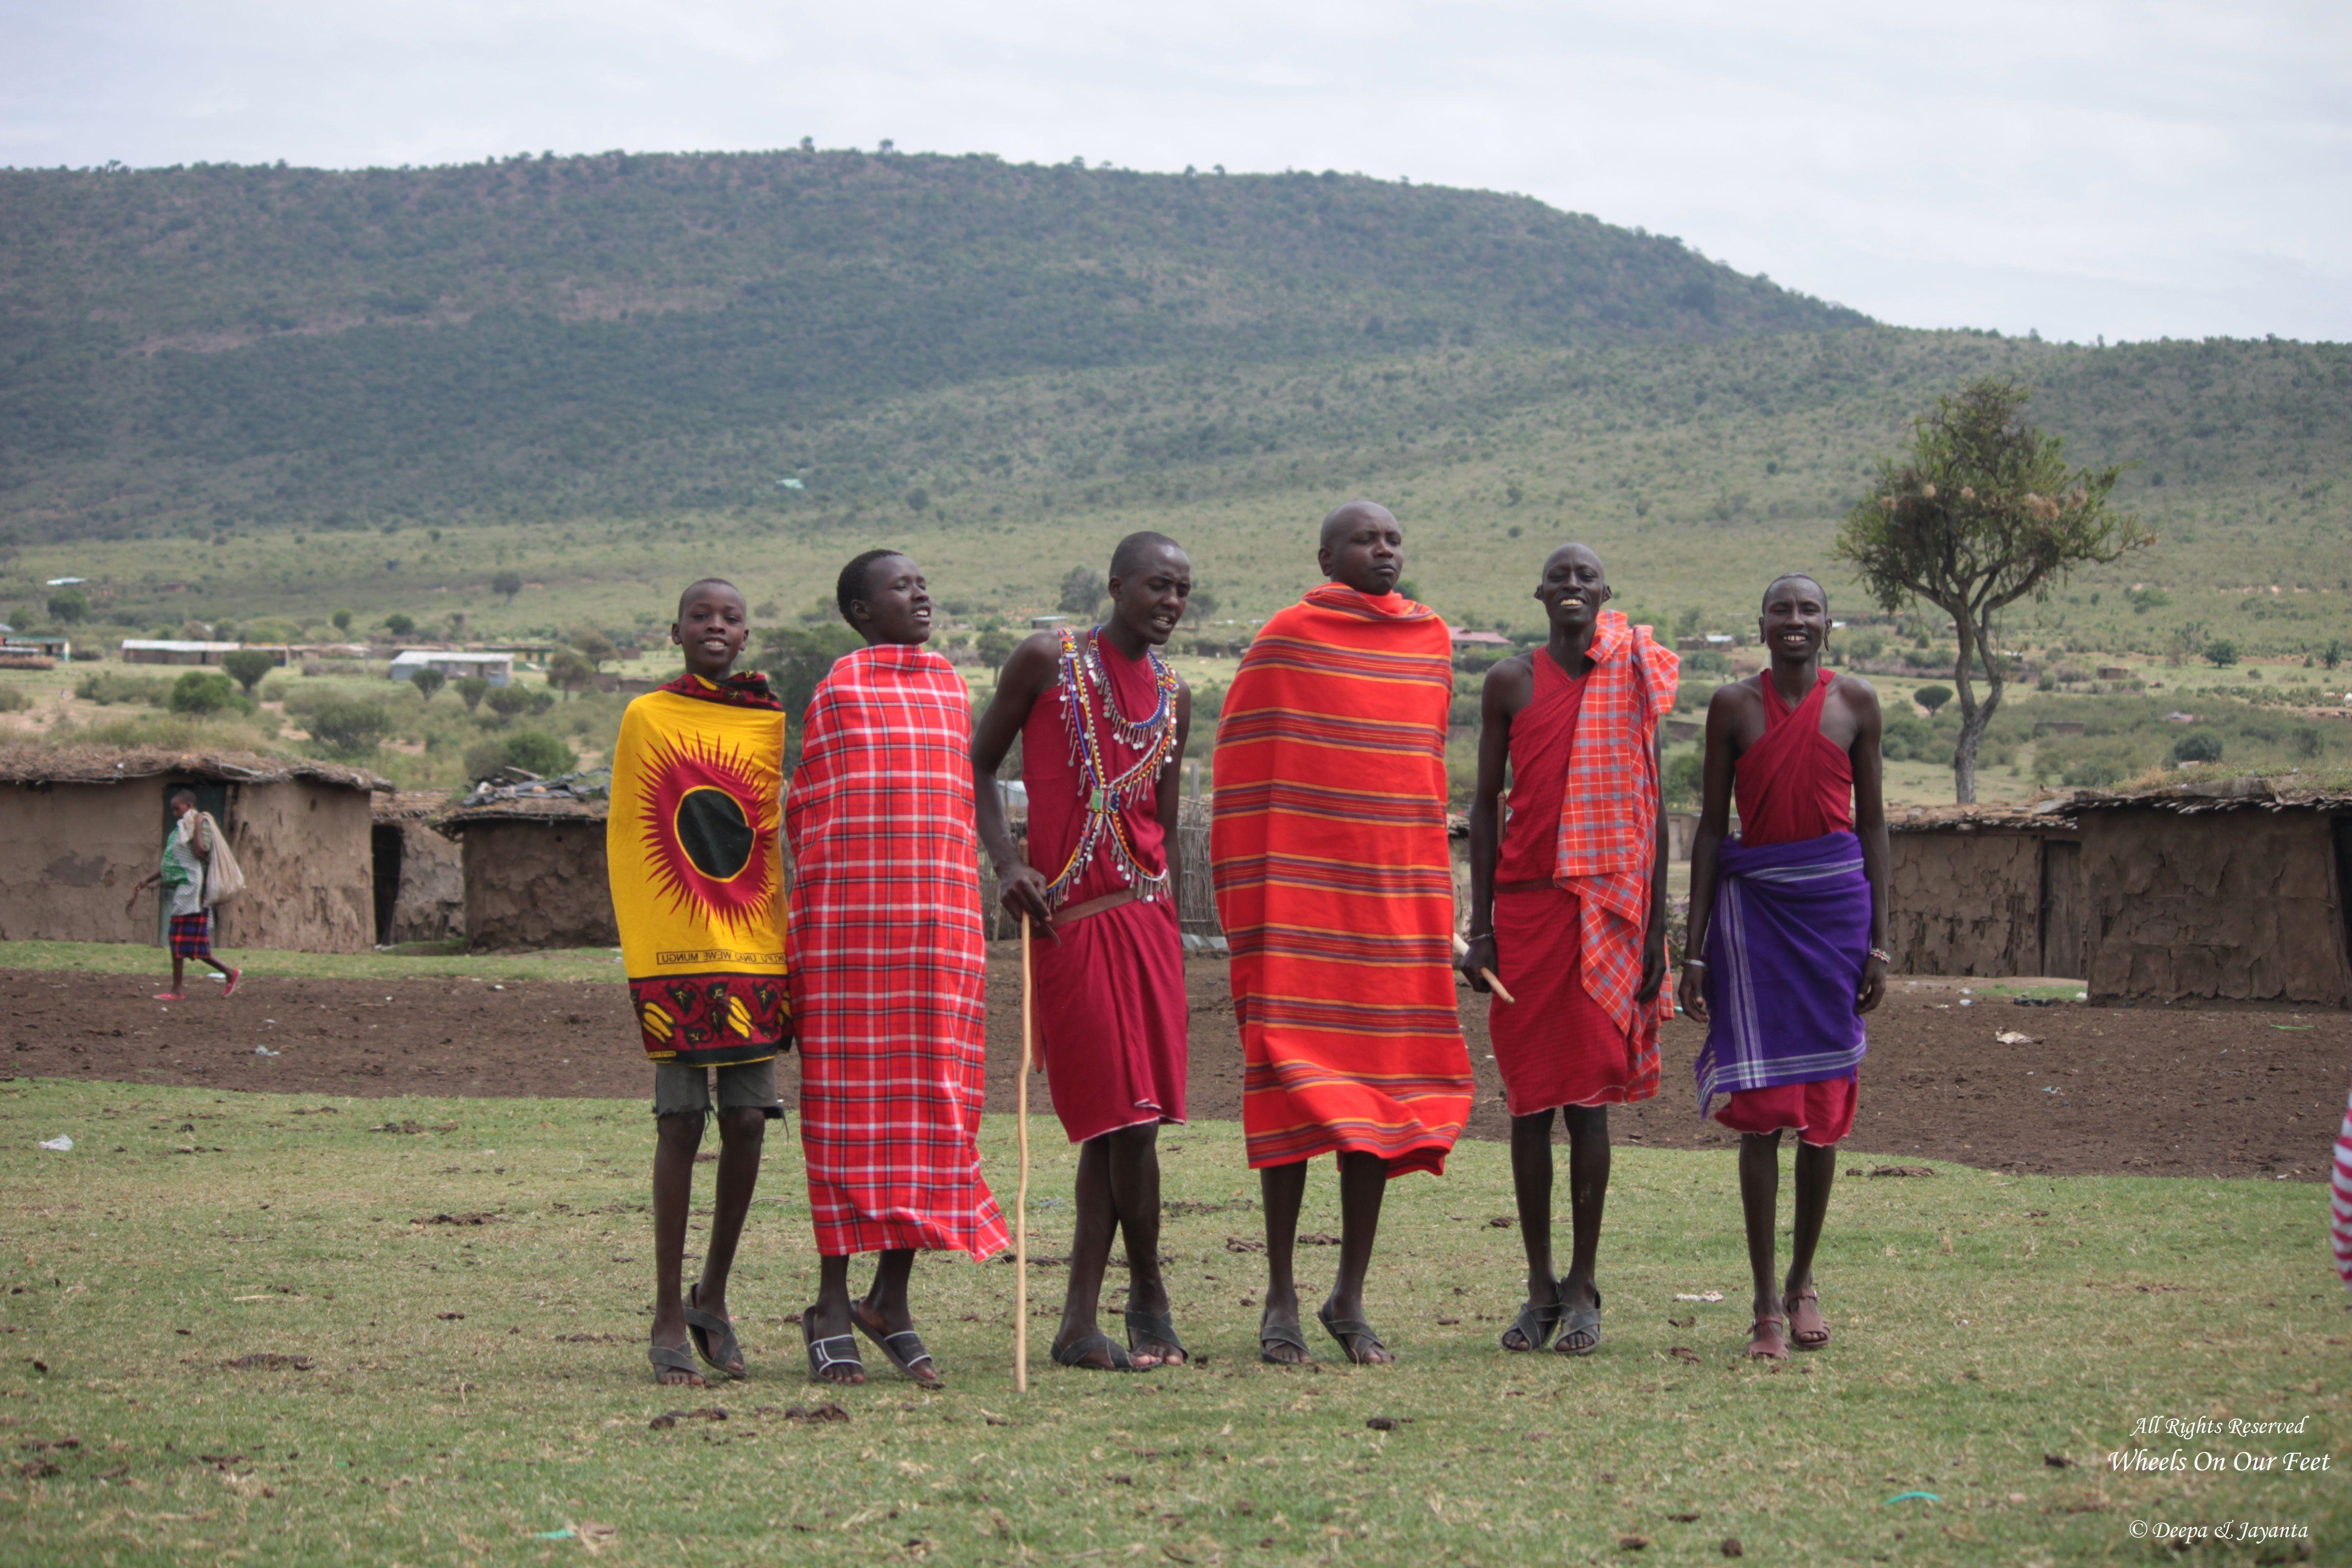 Tour of a Masai Village in Masai Mara, Kenya